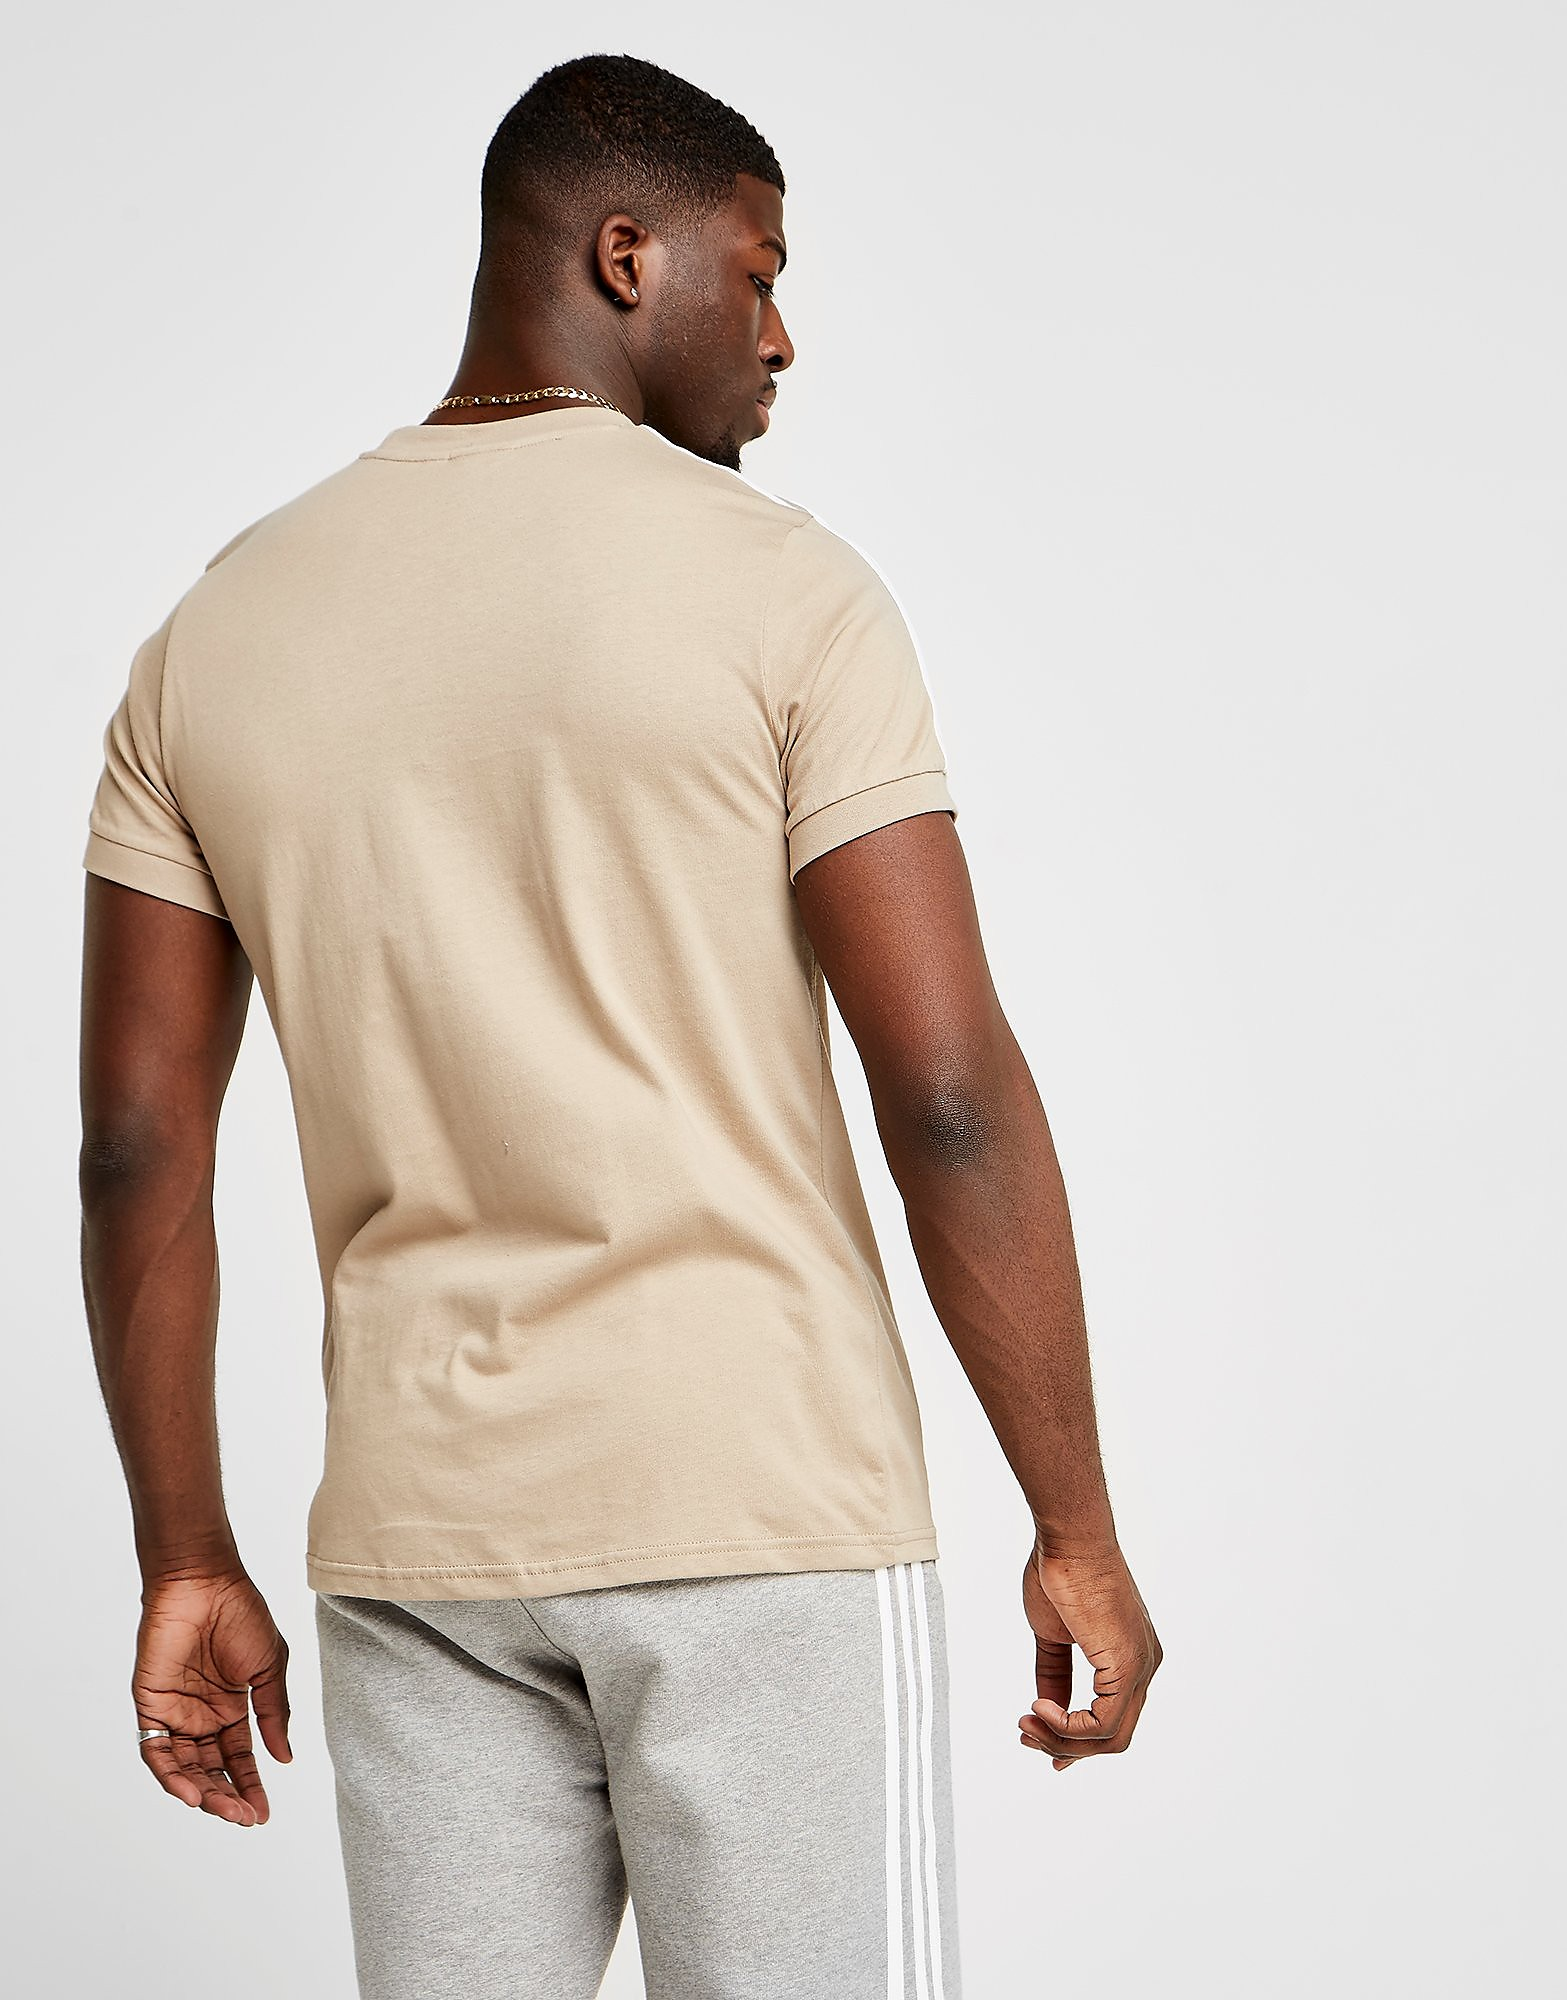 adidas Originals T-shirt Hamburg Homme